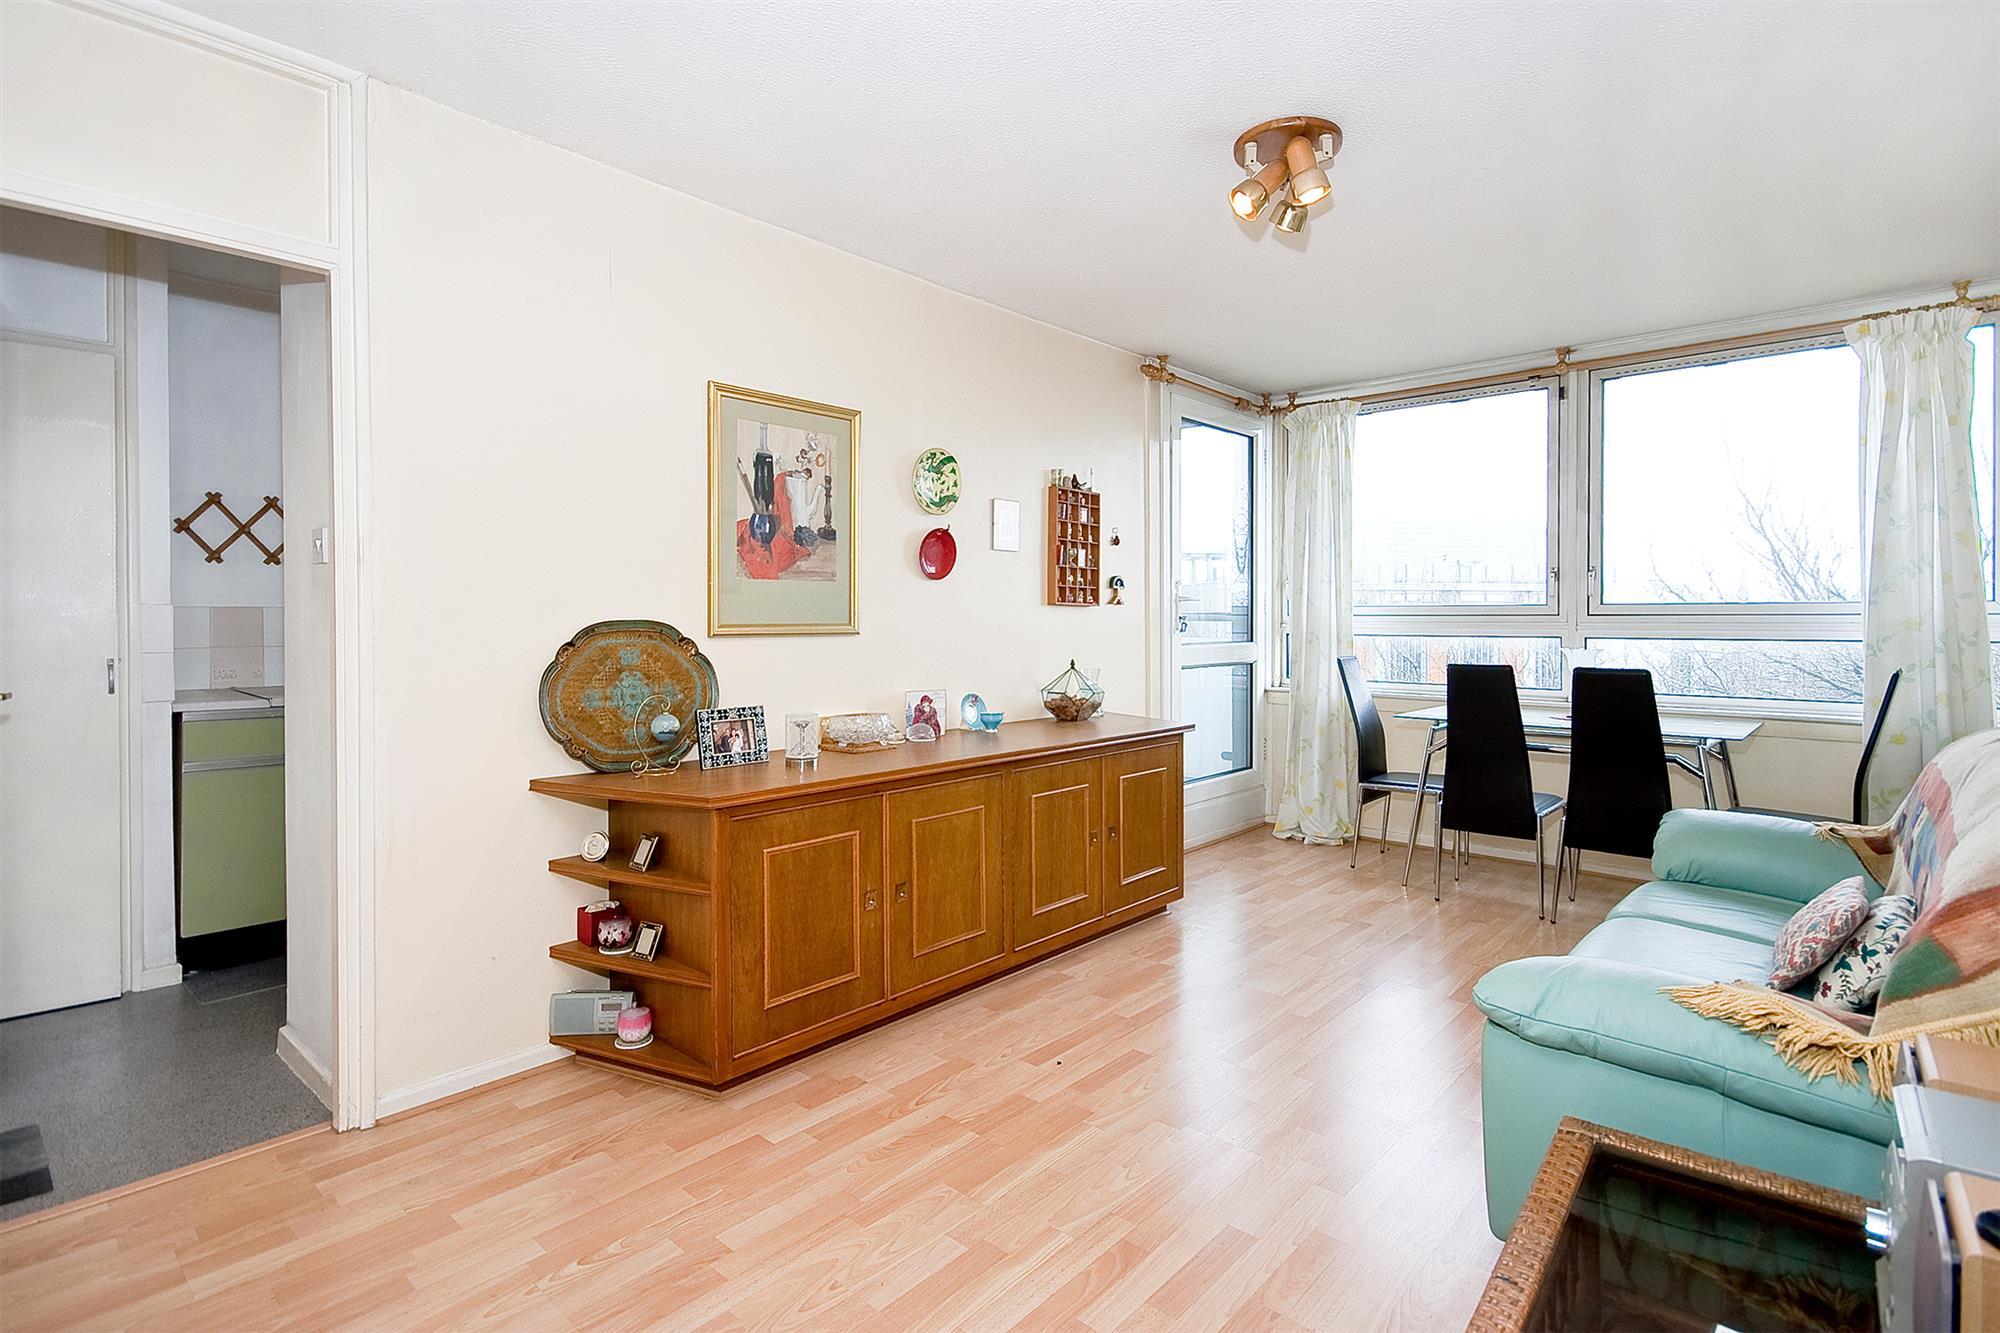 properties for sale 1 bedroom Apartment BRINKLOW HOUSE ...